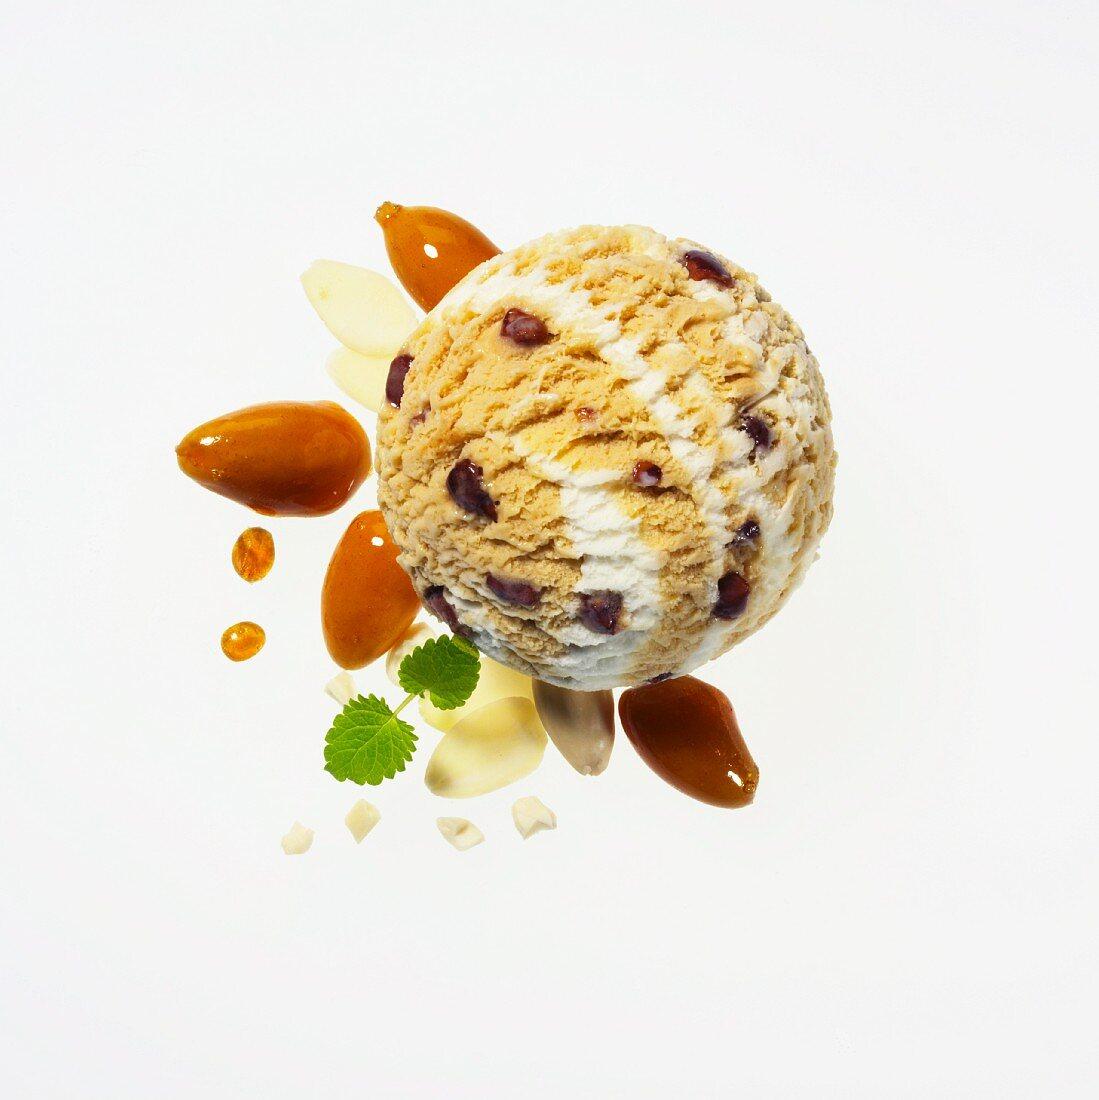 Almond ice cream with caramelised almonds, flaked almonds, chopped almonds, caramel drops and lemon balm